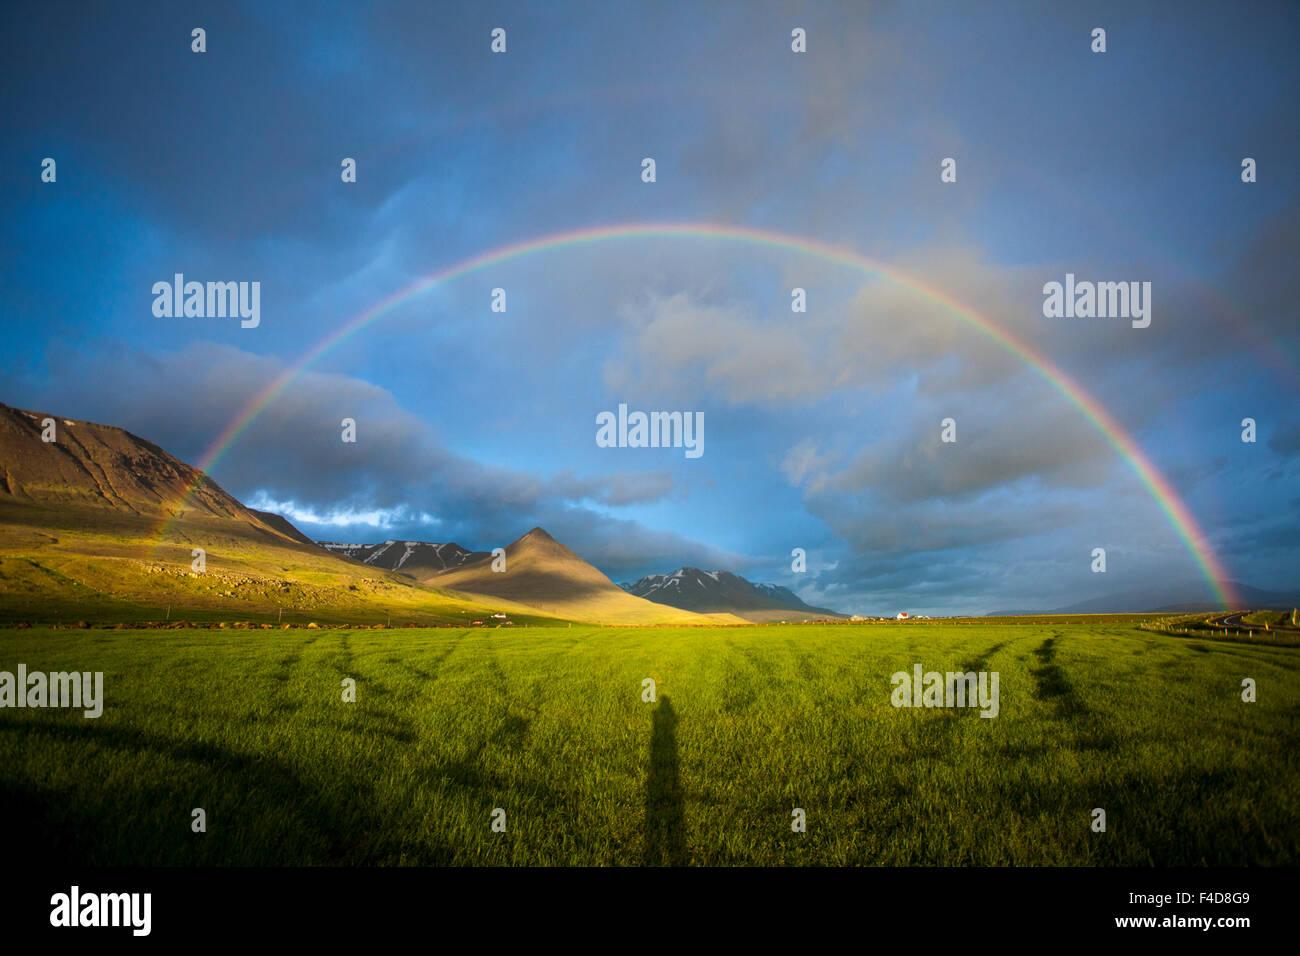 Abend Regenbogen über dem Heradsvotn Tal, Sao Martinho do Porto, Nordhurland Djupivogur, Island. Stockbild